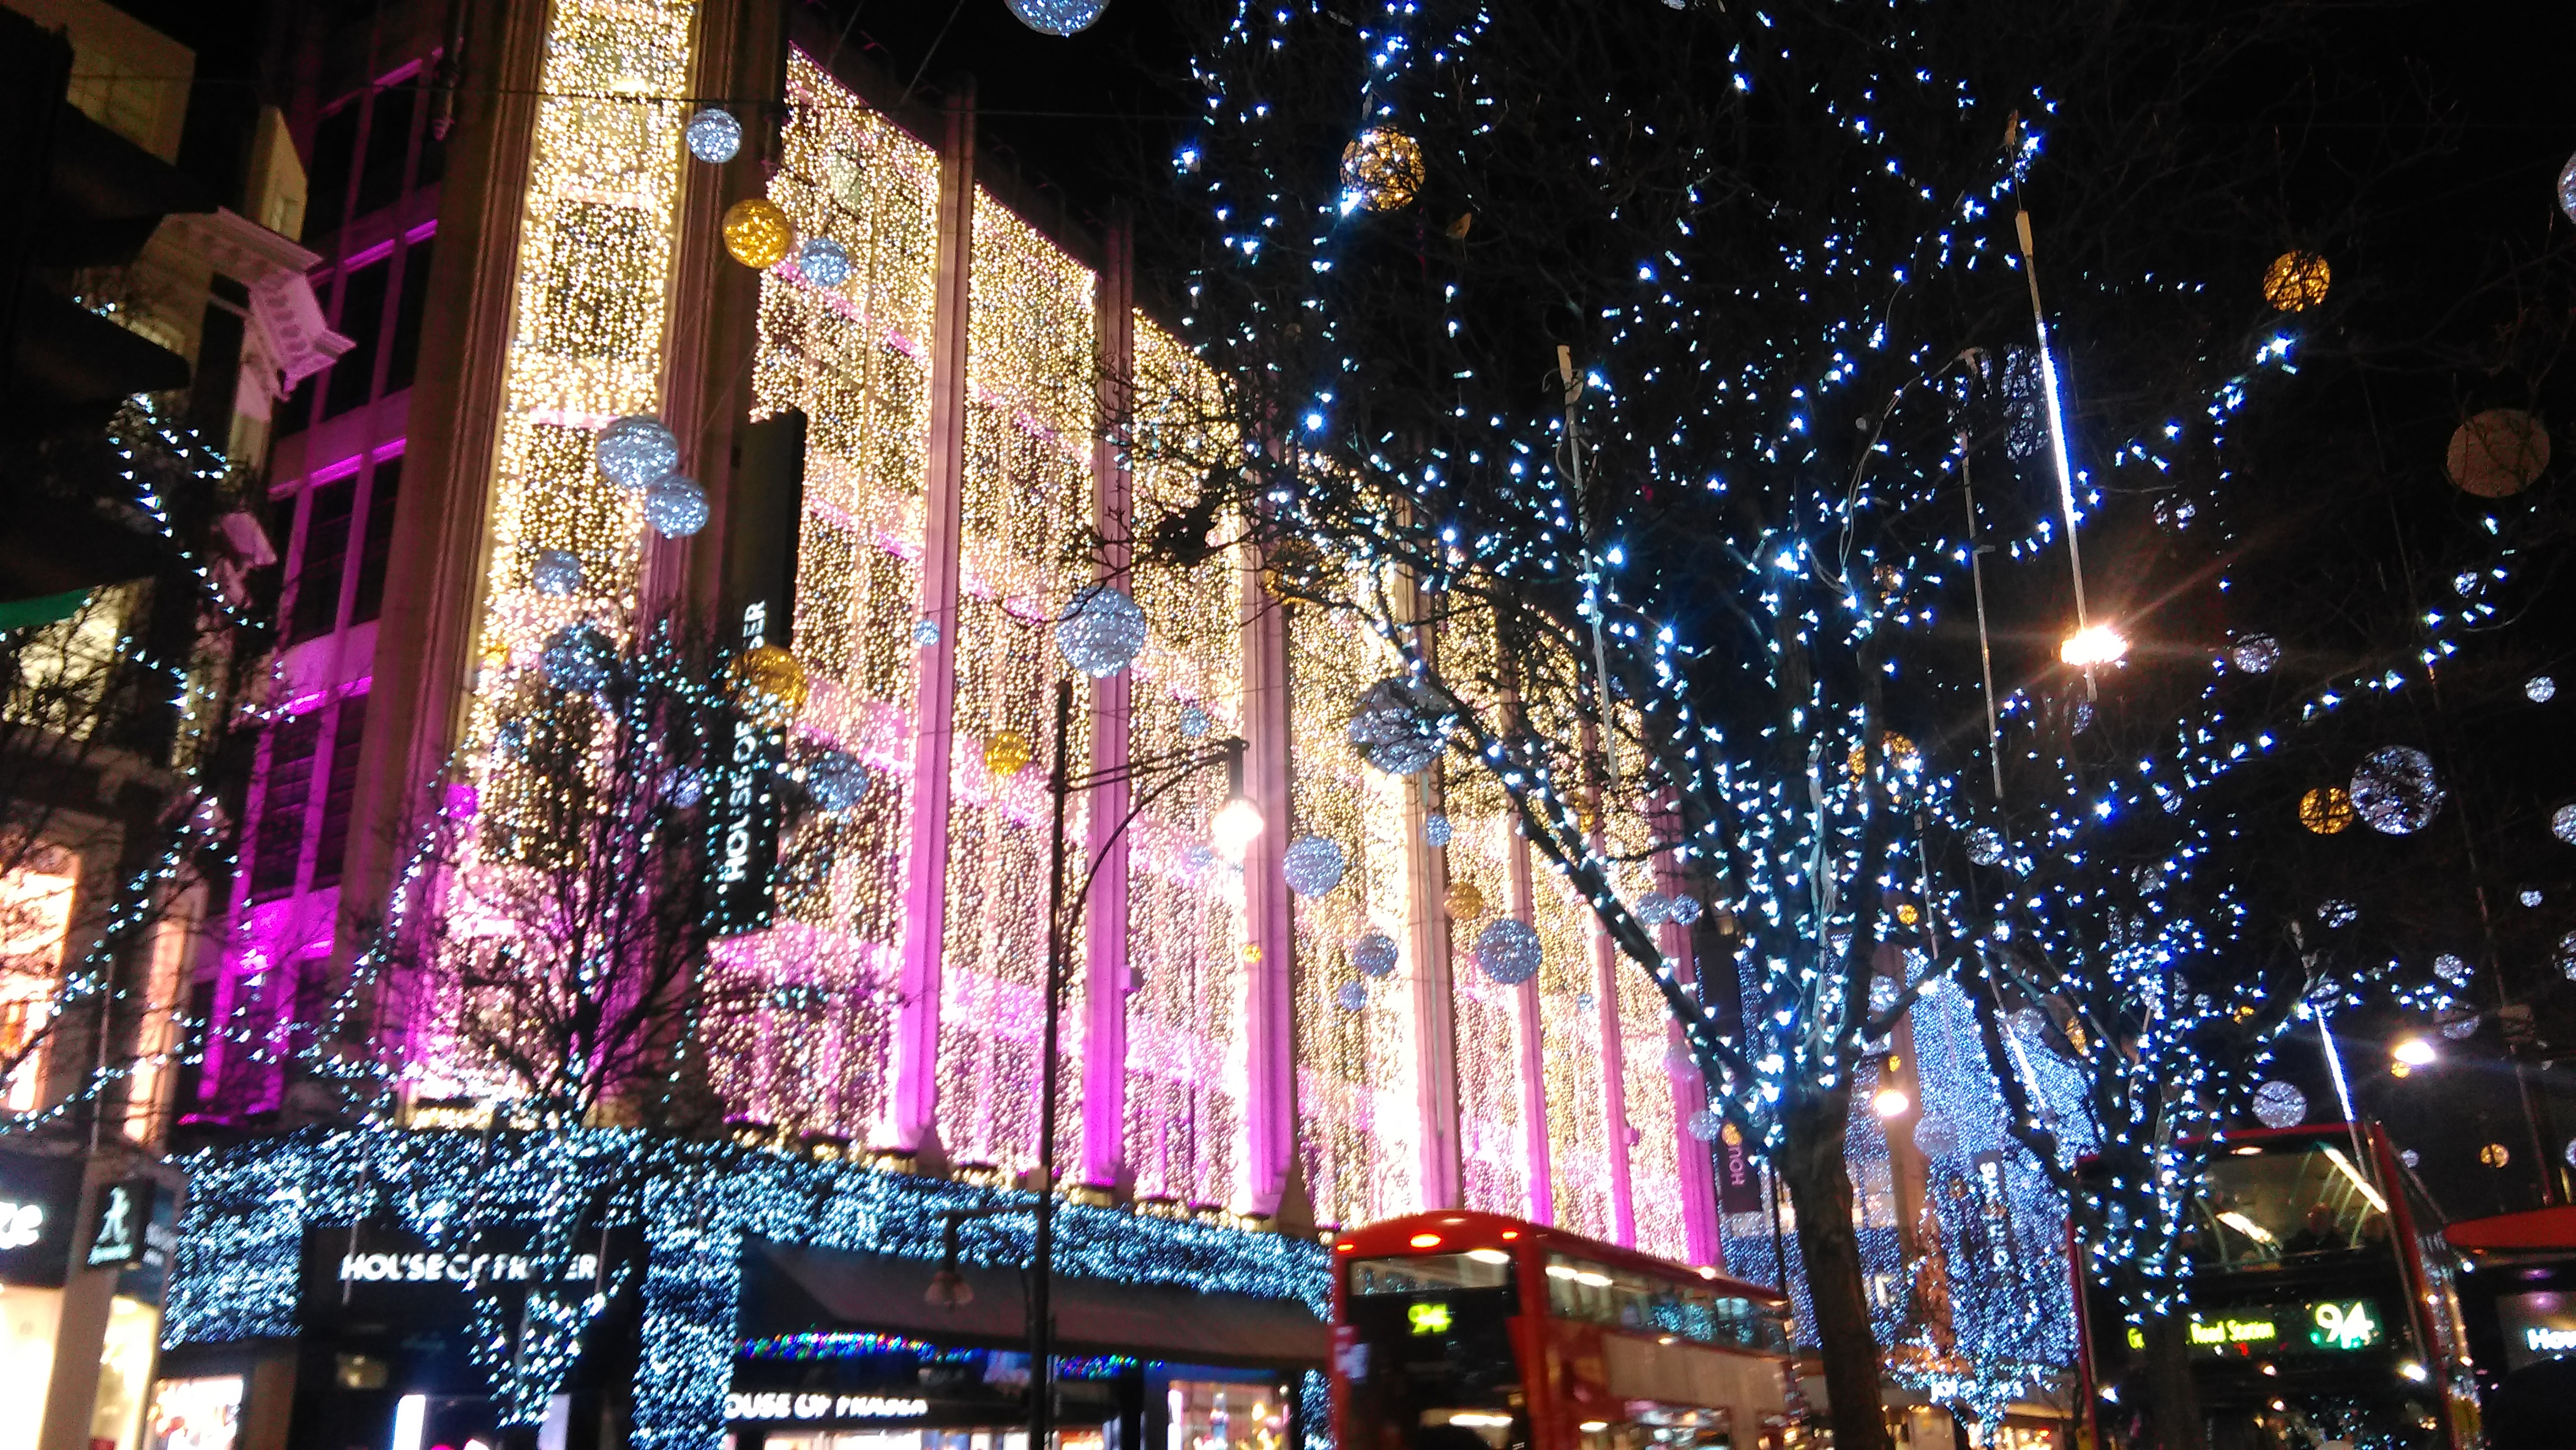 a4ac7050e159 File:Christmas 2016 Decorations House of Fraser, Oxford Street, London 2.jpg